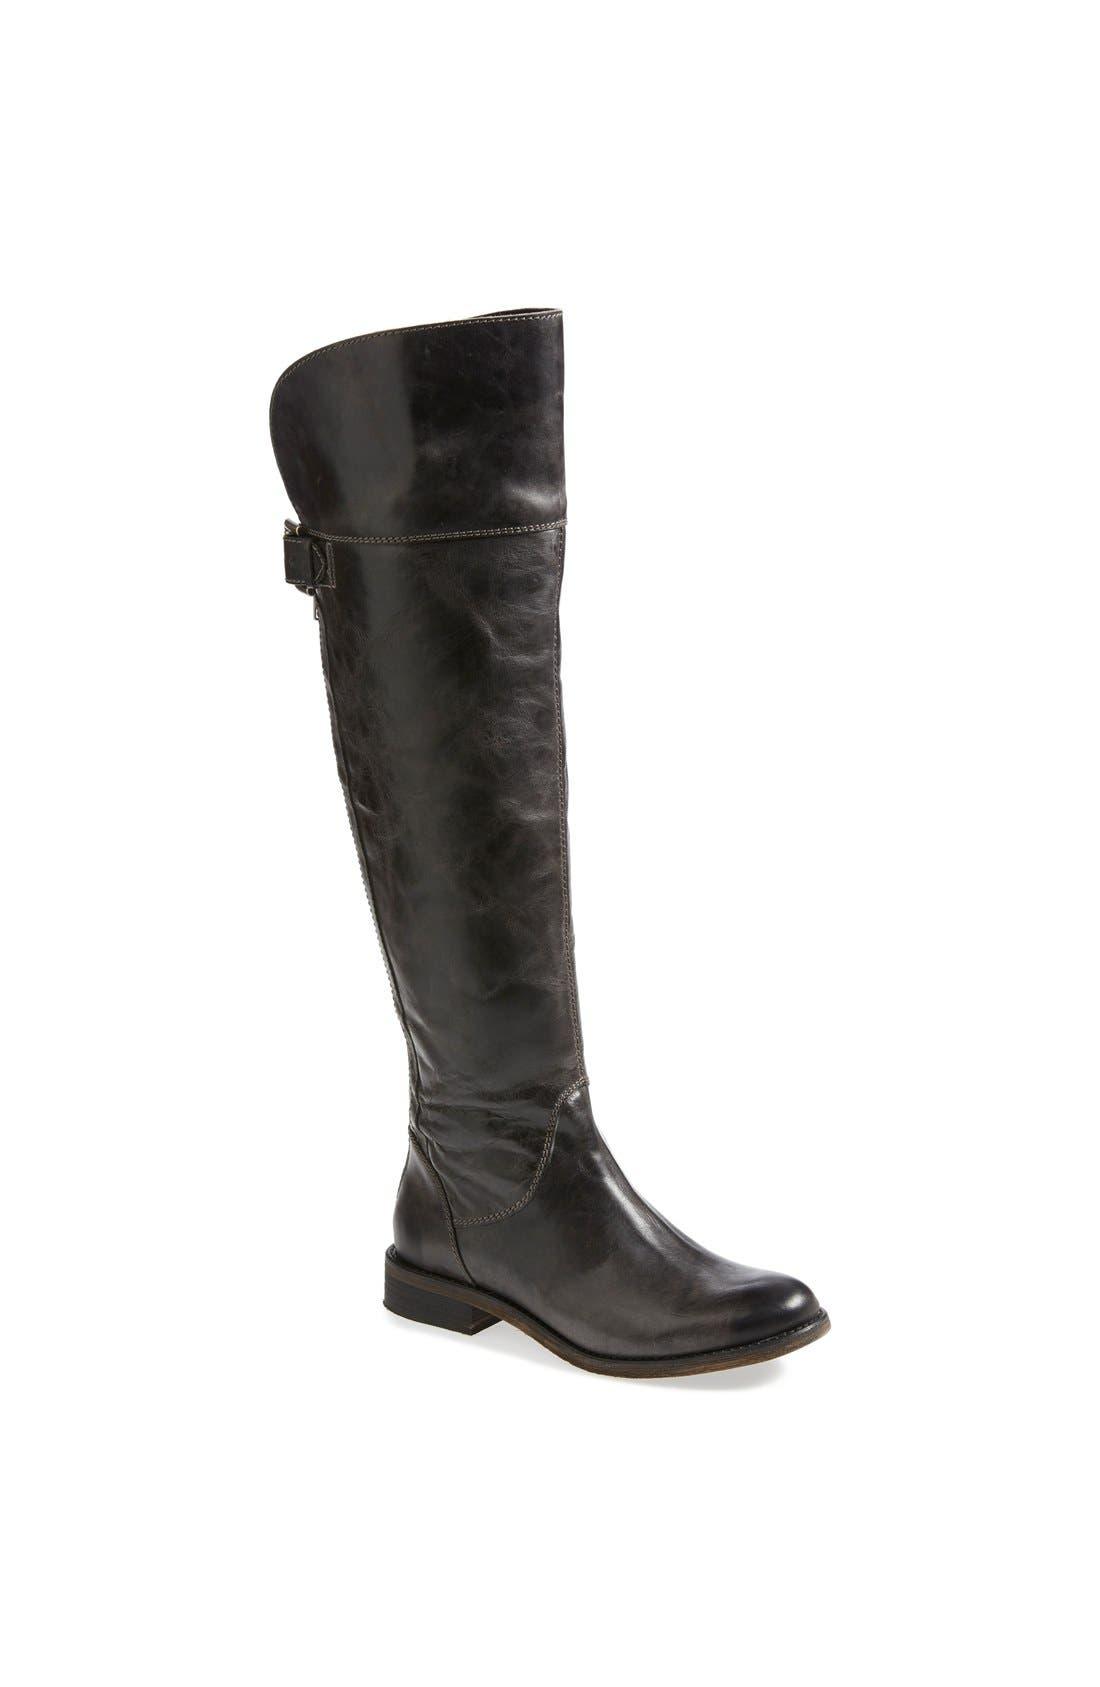 Alternate Image 1 Selected - Hinge 'Sannibel' Leather Over the Knee Boot (Women)